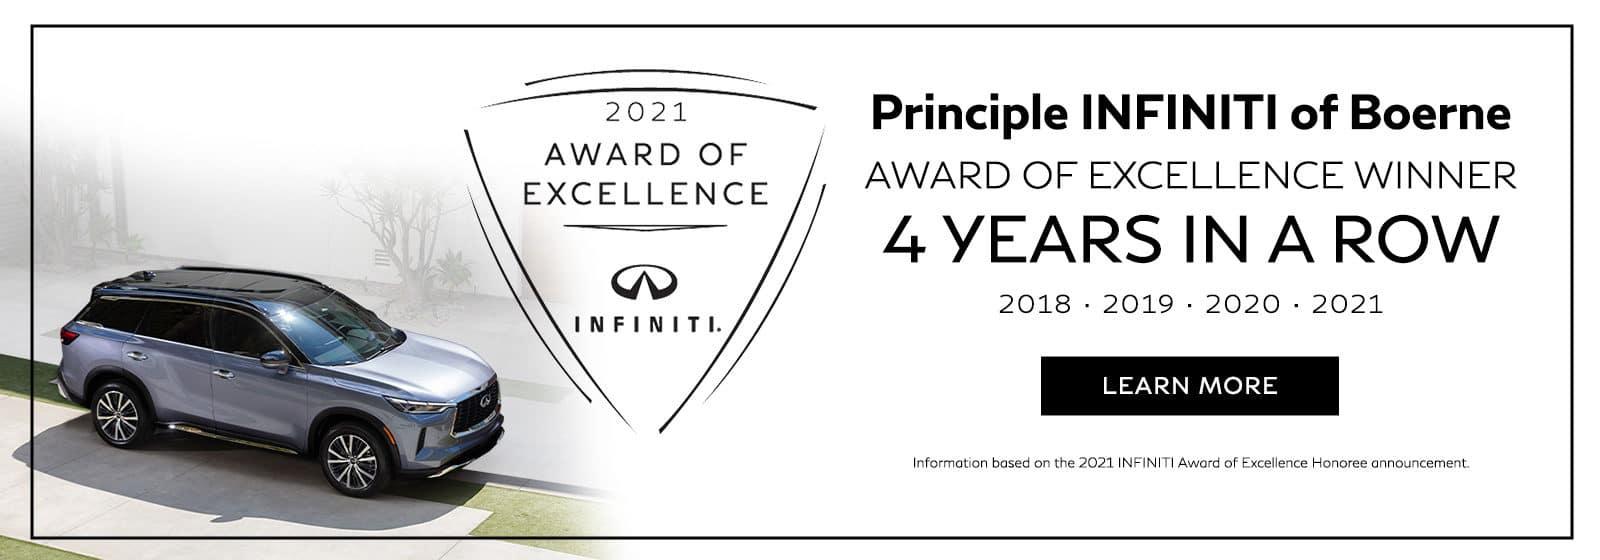 PrincipleInfinitiofBoerne_Award_Slide_10-21